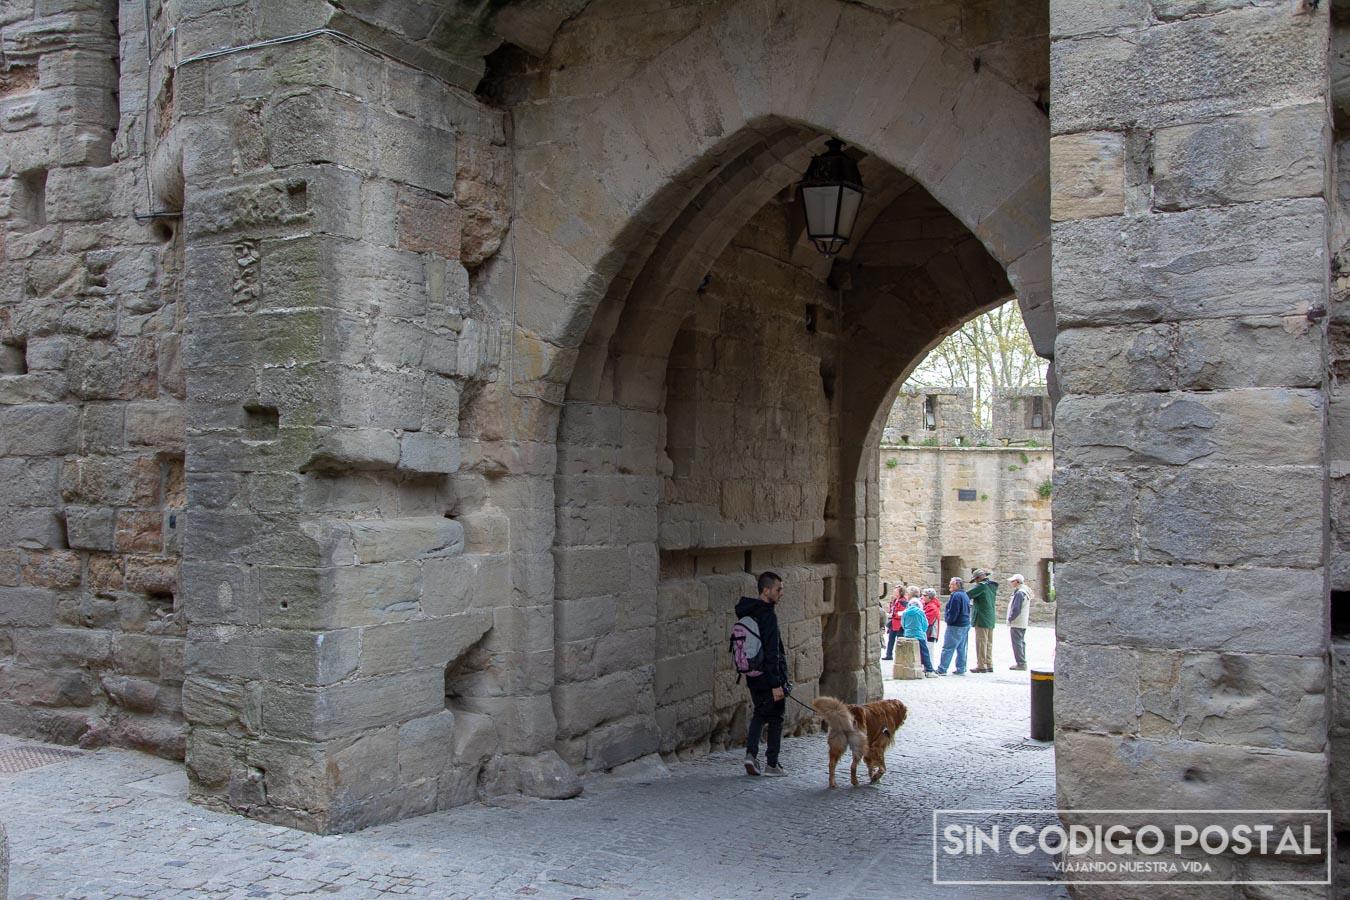 Puerta de Aude en Carcasona